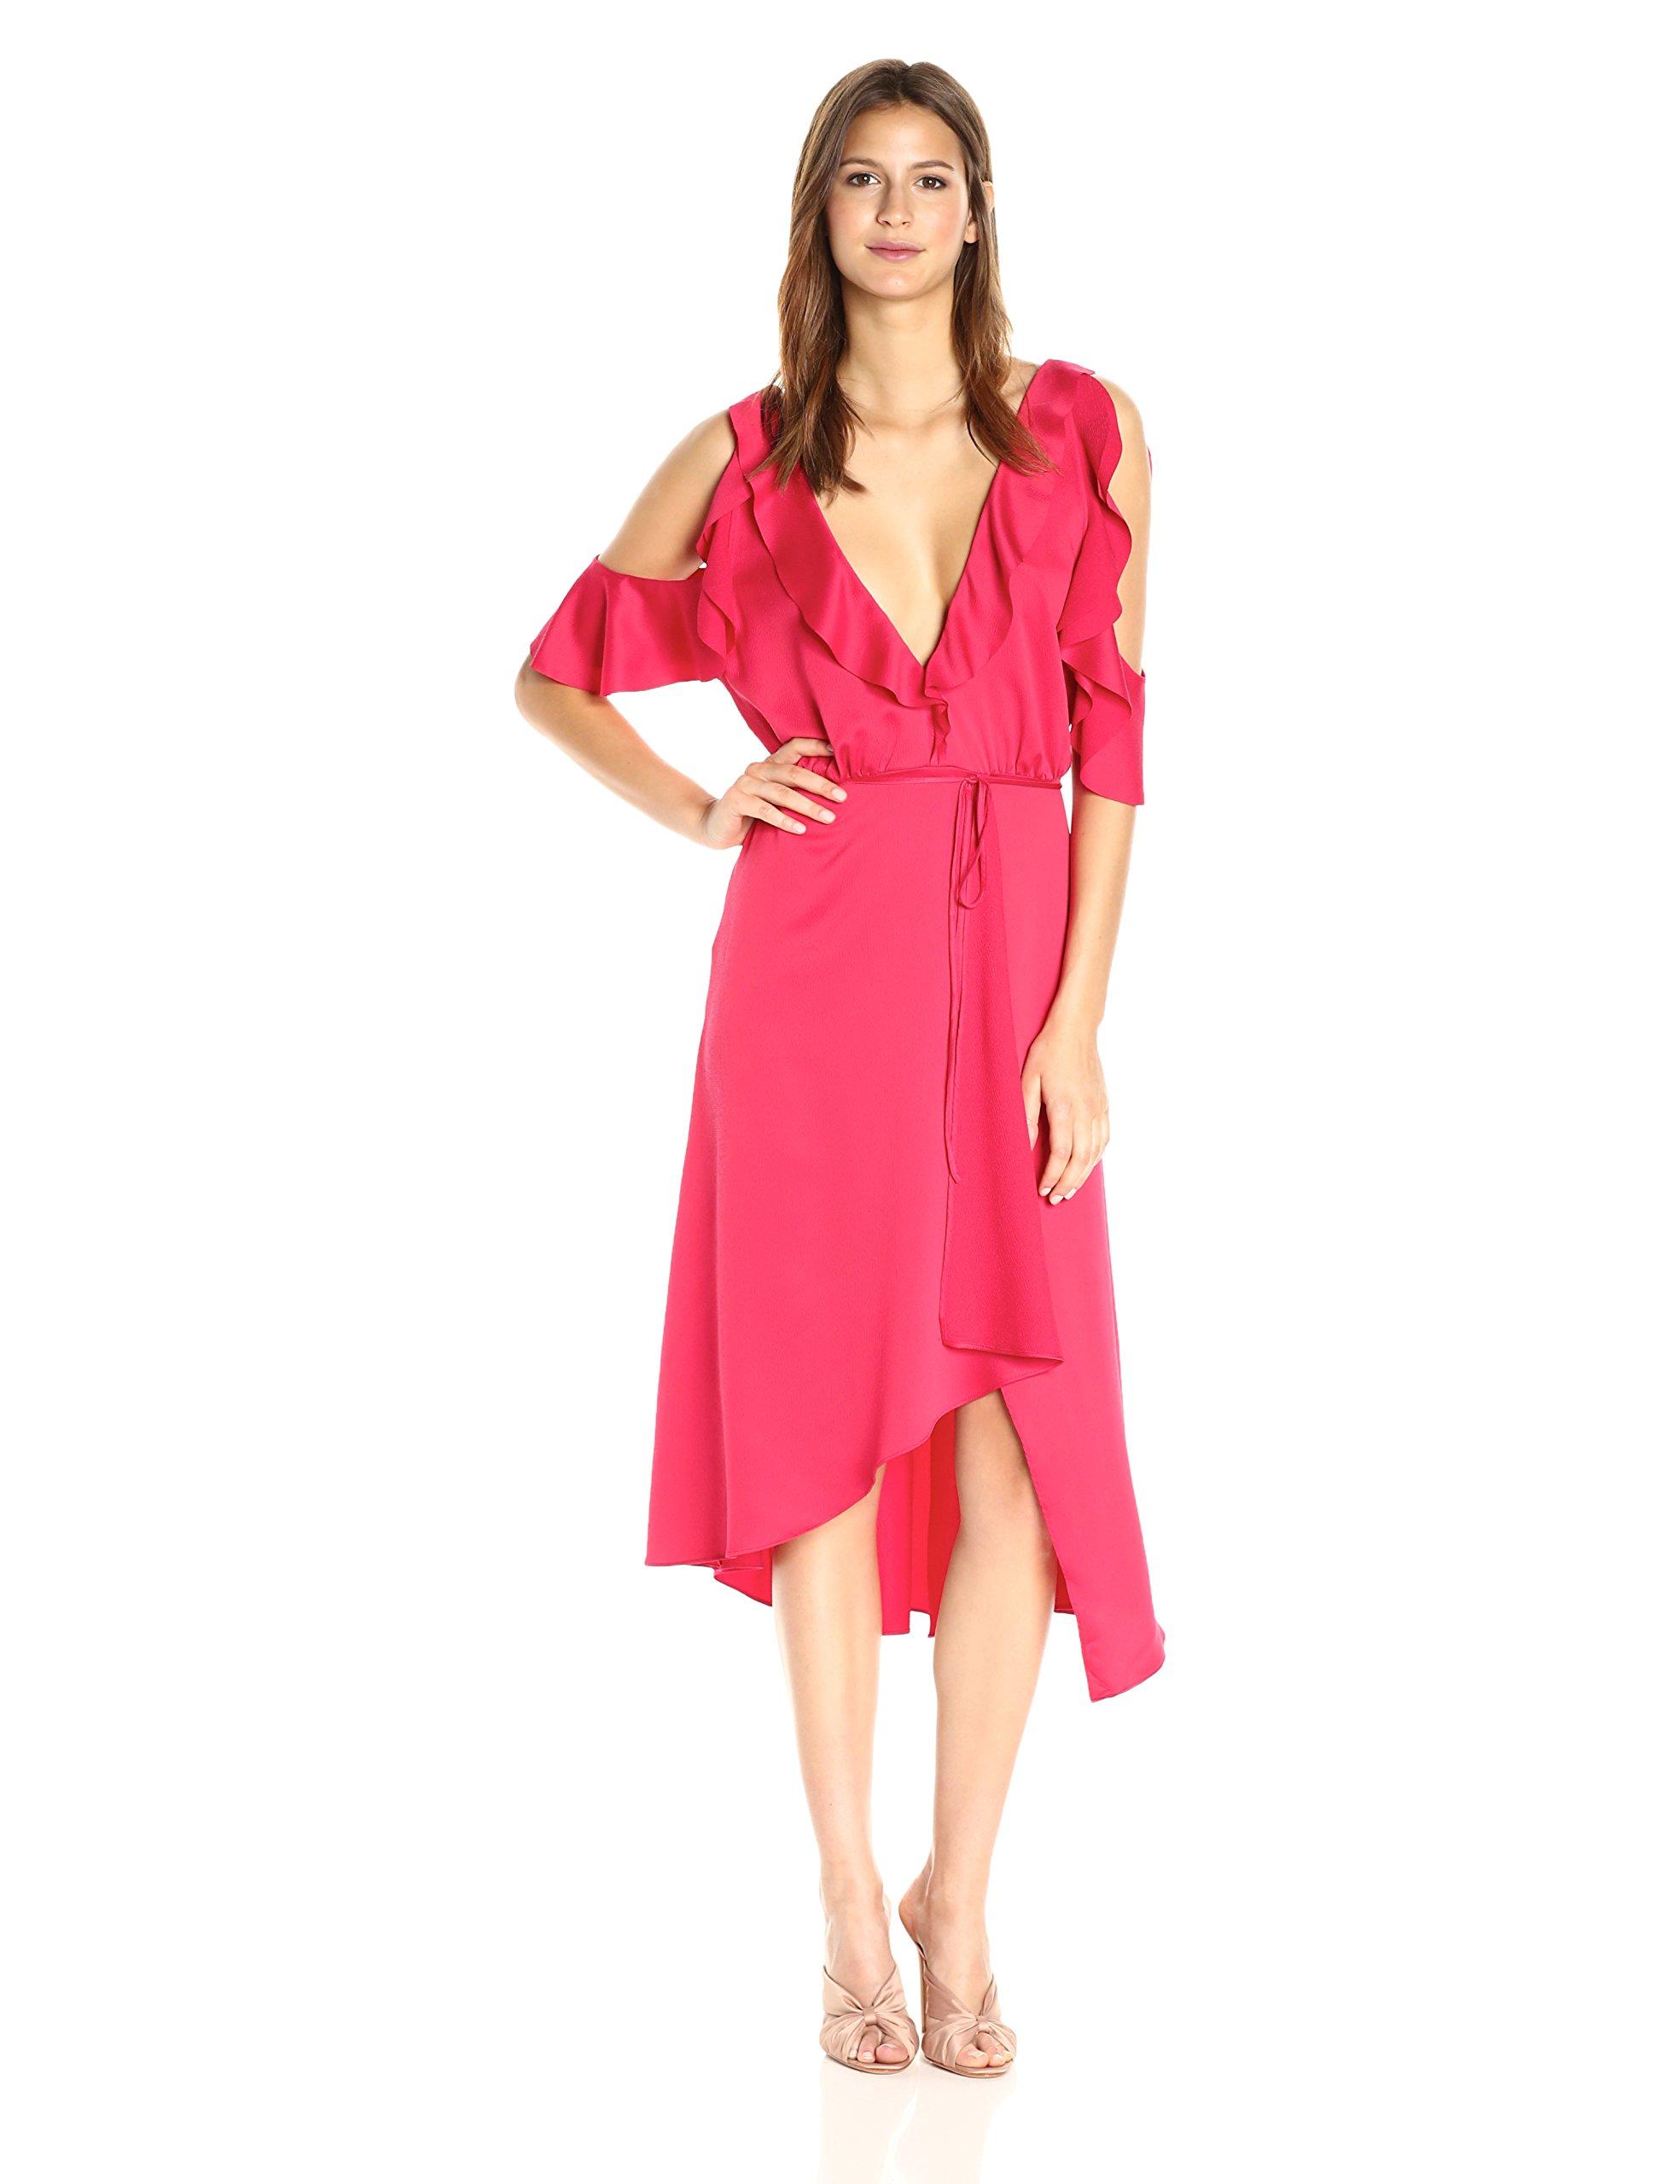 French Connection Women's Maudie Drape Dress, Watermelon, 2